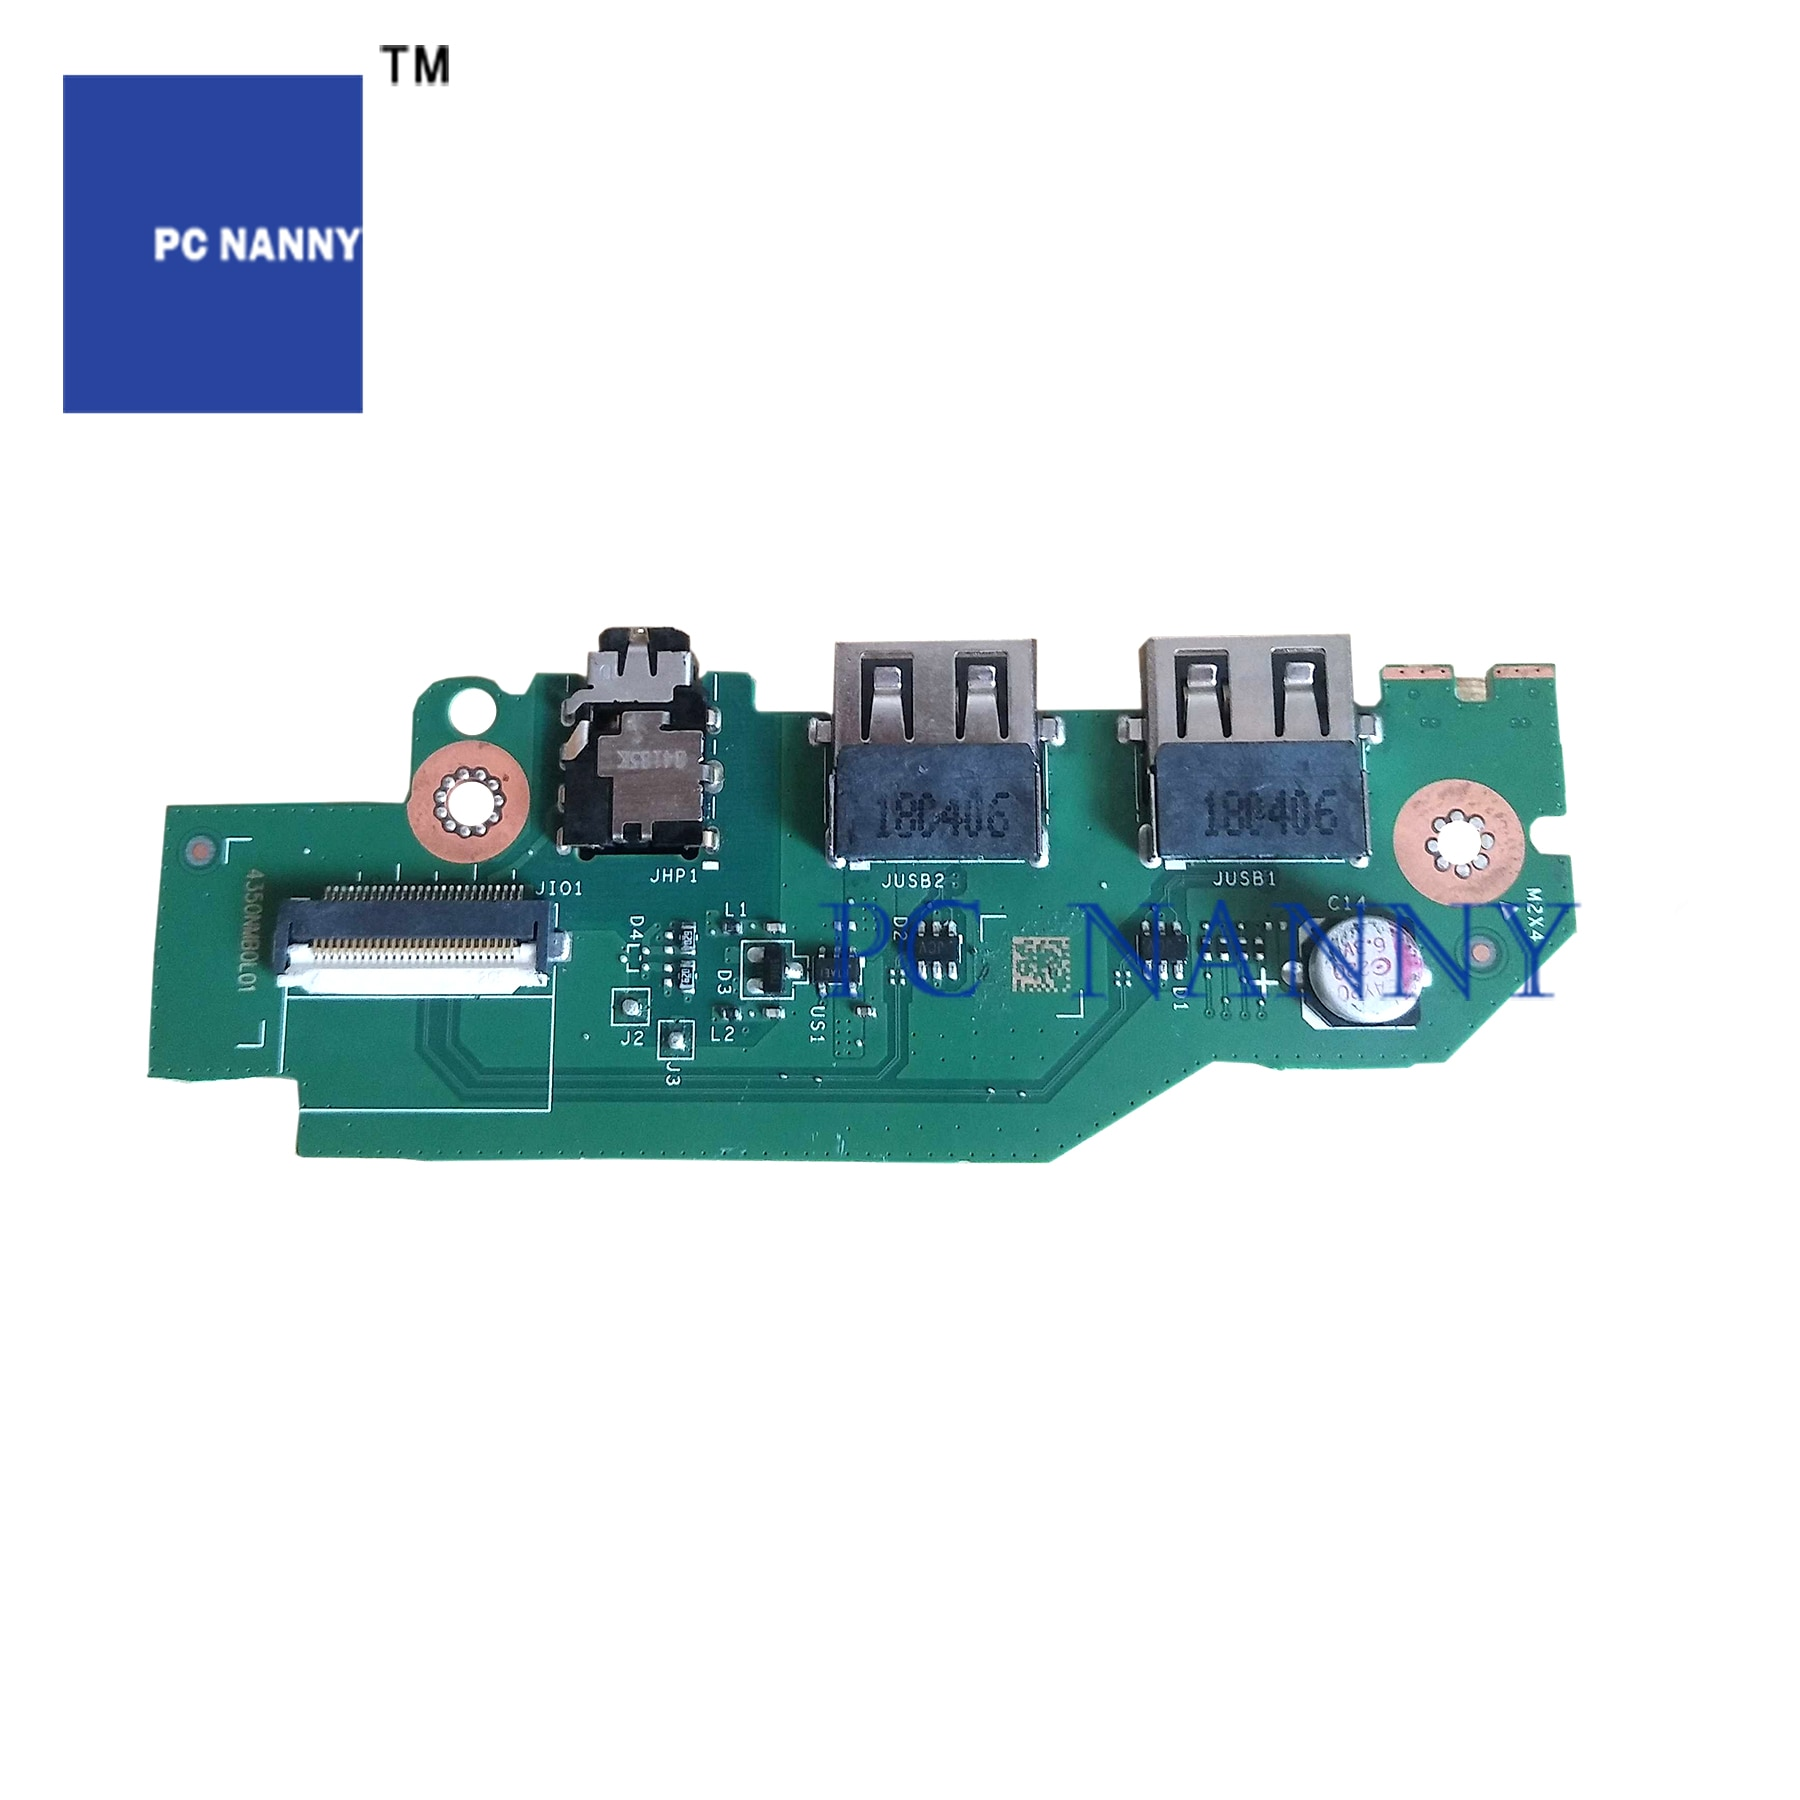 PCNANNY لشركة أيسر نيترو AN515-52 AN515 DH5VF LA-F954P usb الصوت مجلس لوحة اللمس تراكباد رئيس مجموعة اختبار جيدة